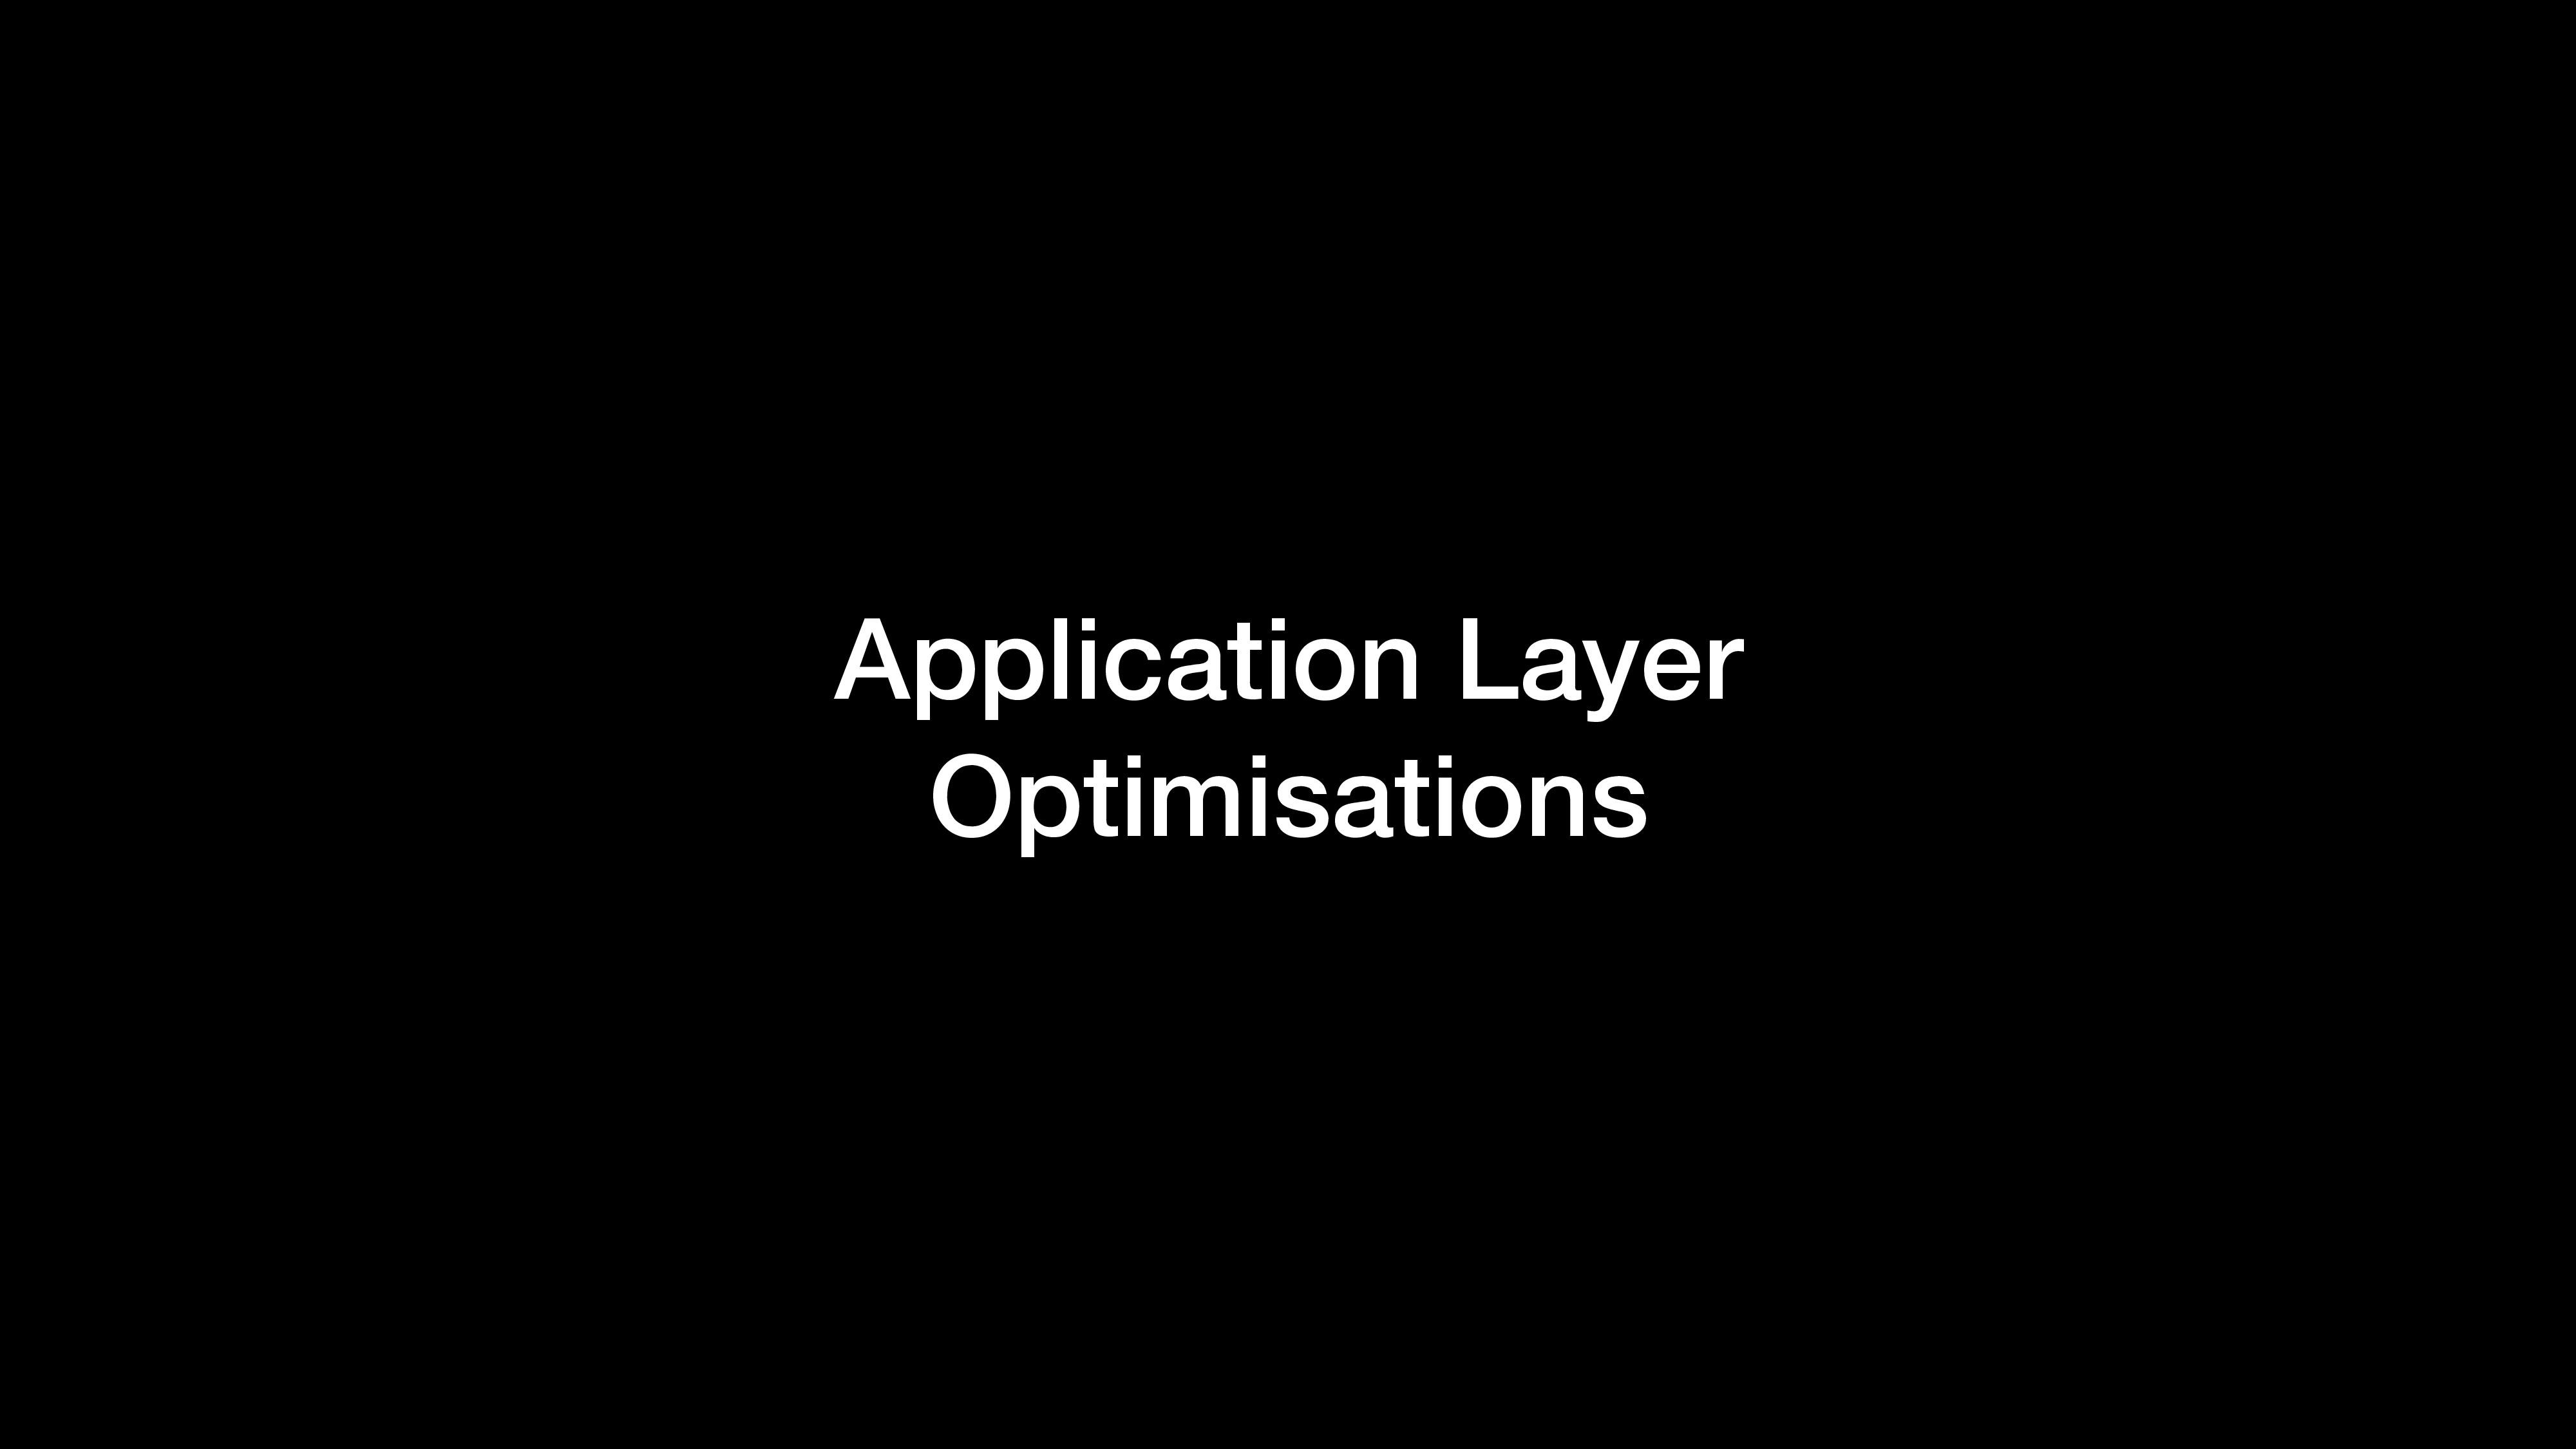 Application Layer Optimisations